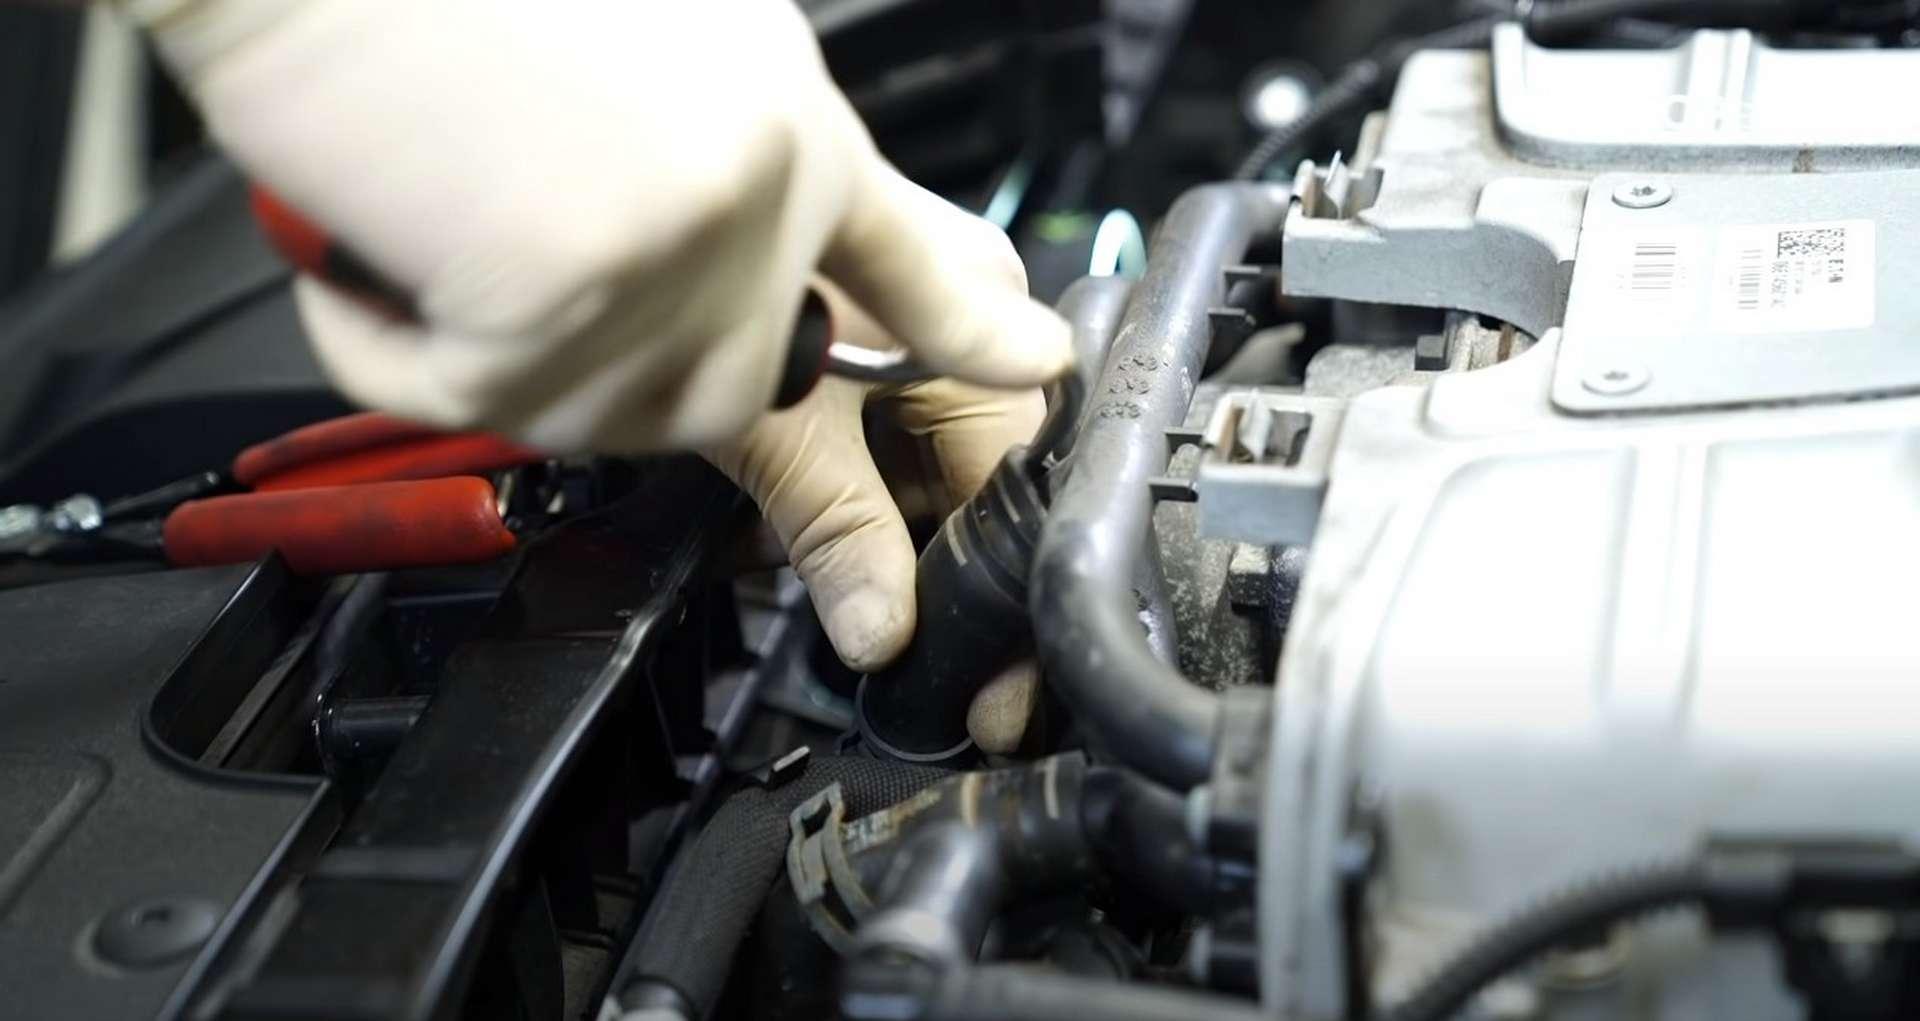 DIY Audi 3.0t Walnut Blasting Intake Valves removing the supercharger coolant hoses